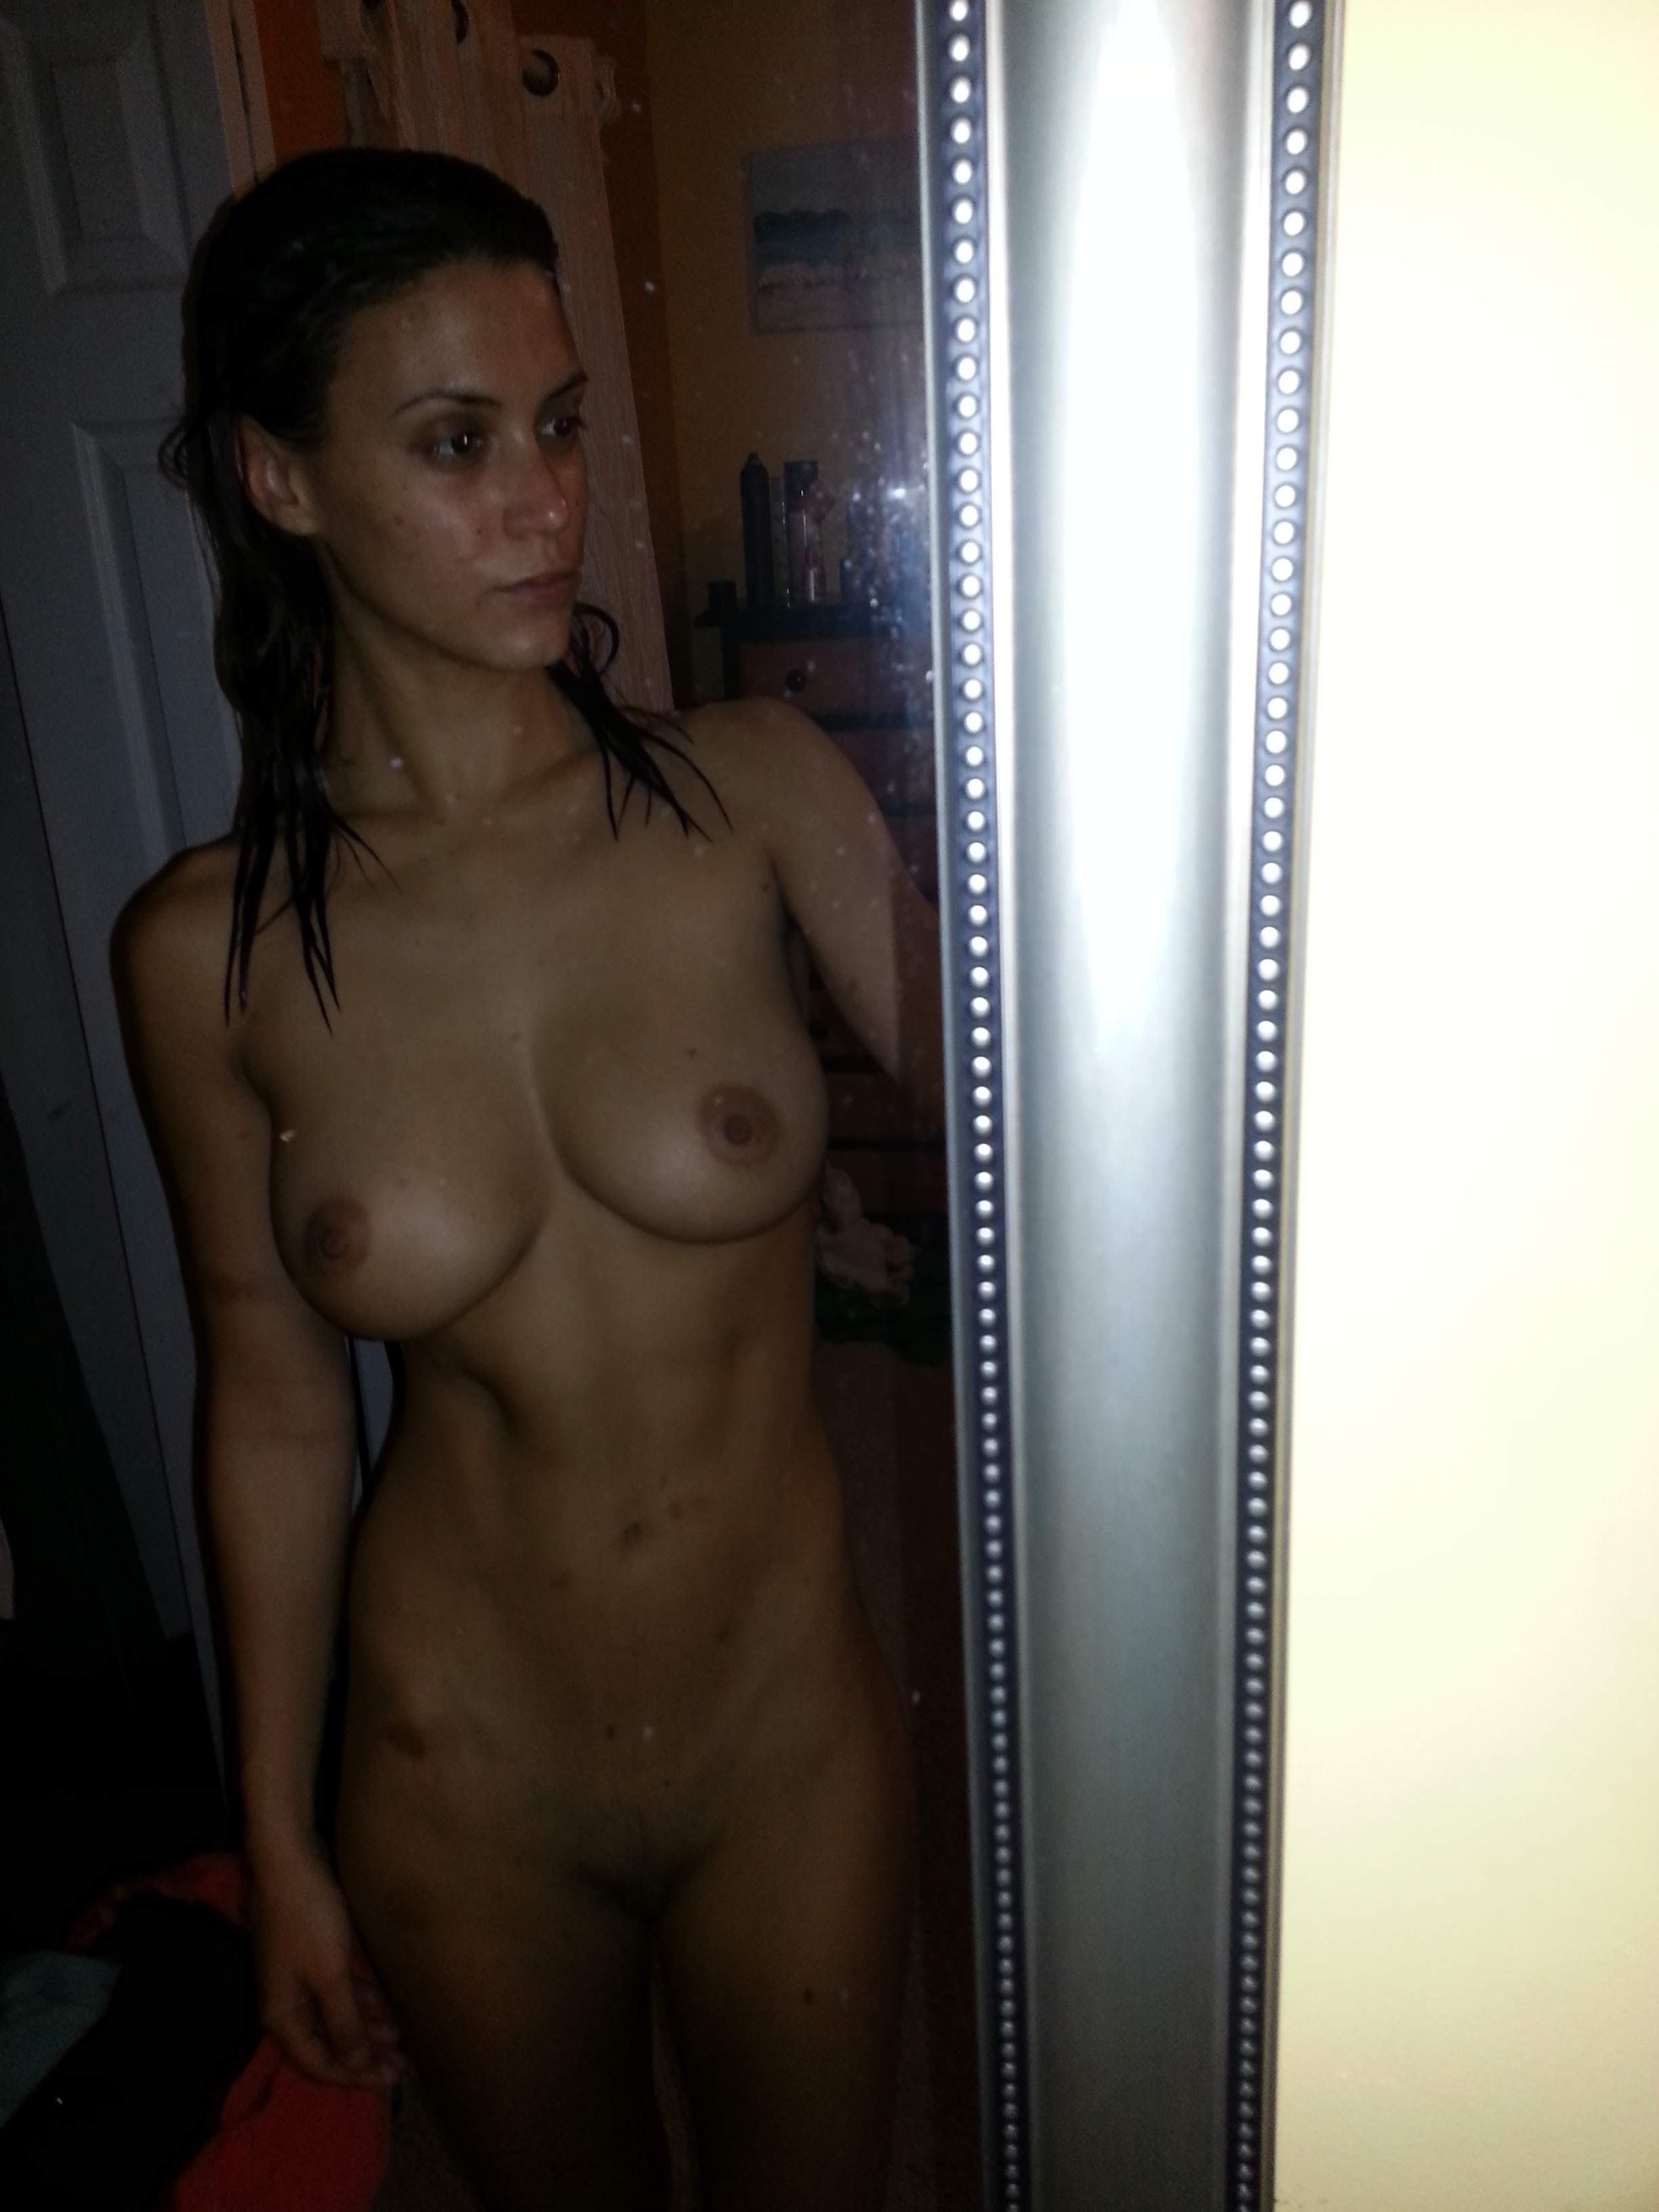 Topic Celebrity Nude Icloud Leaks Sorry, That Has